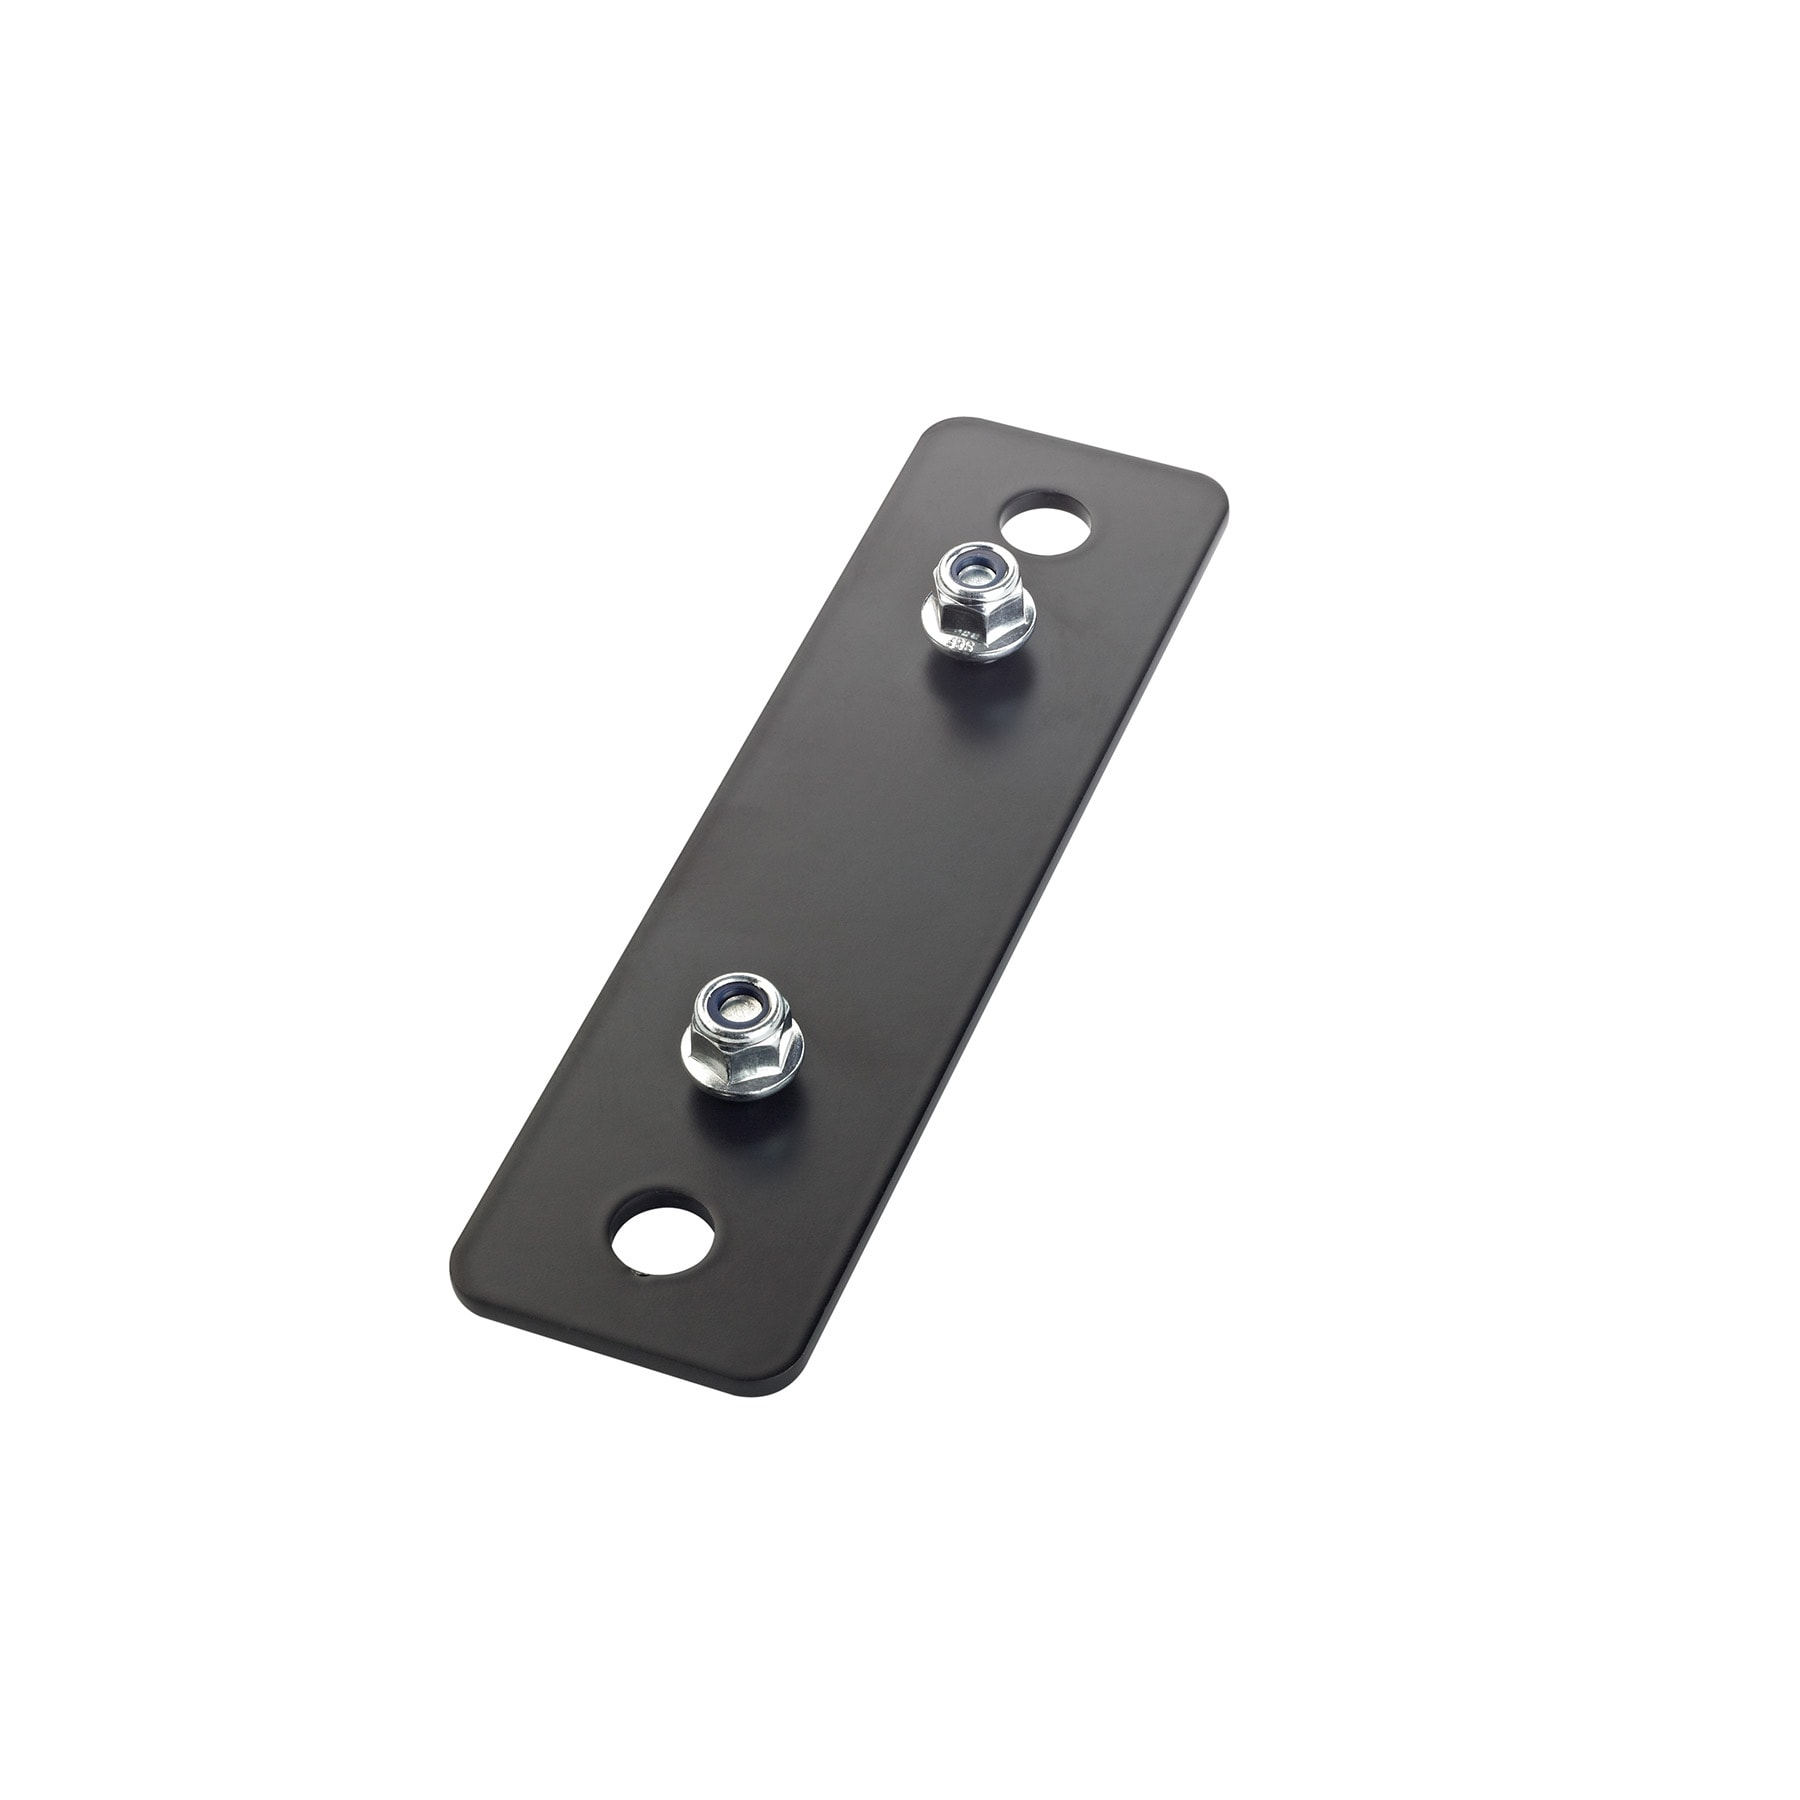 KM24358 - Adapter panel 5